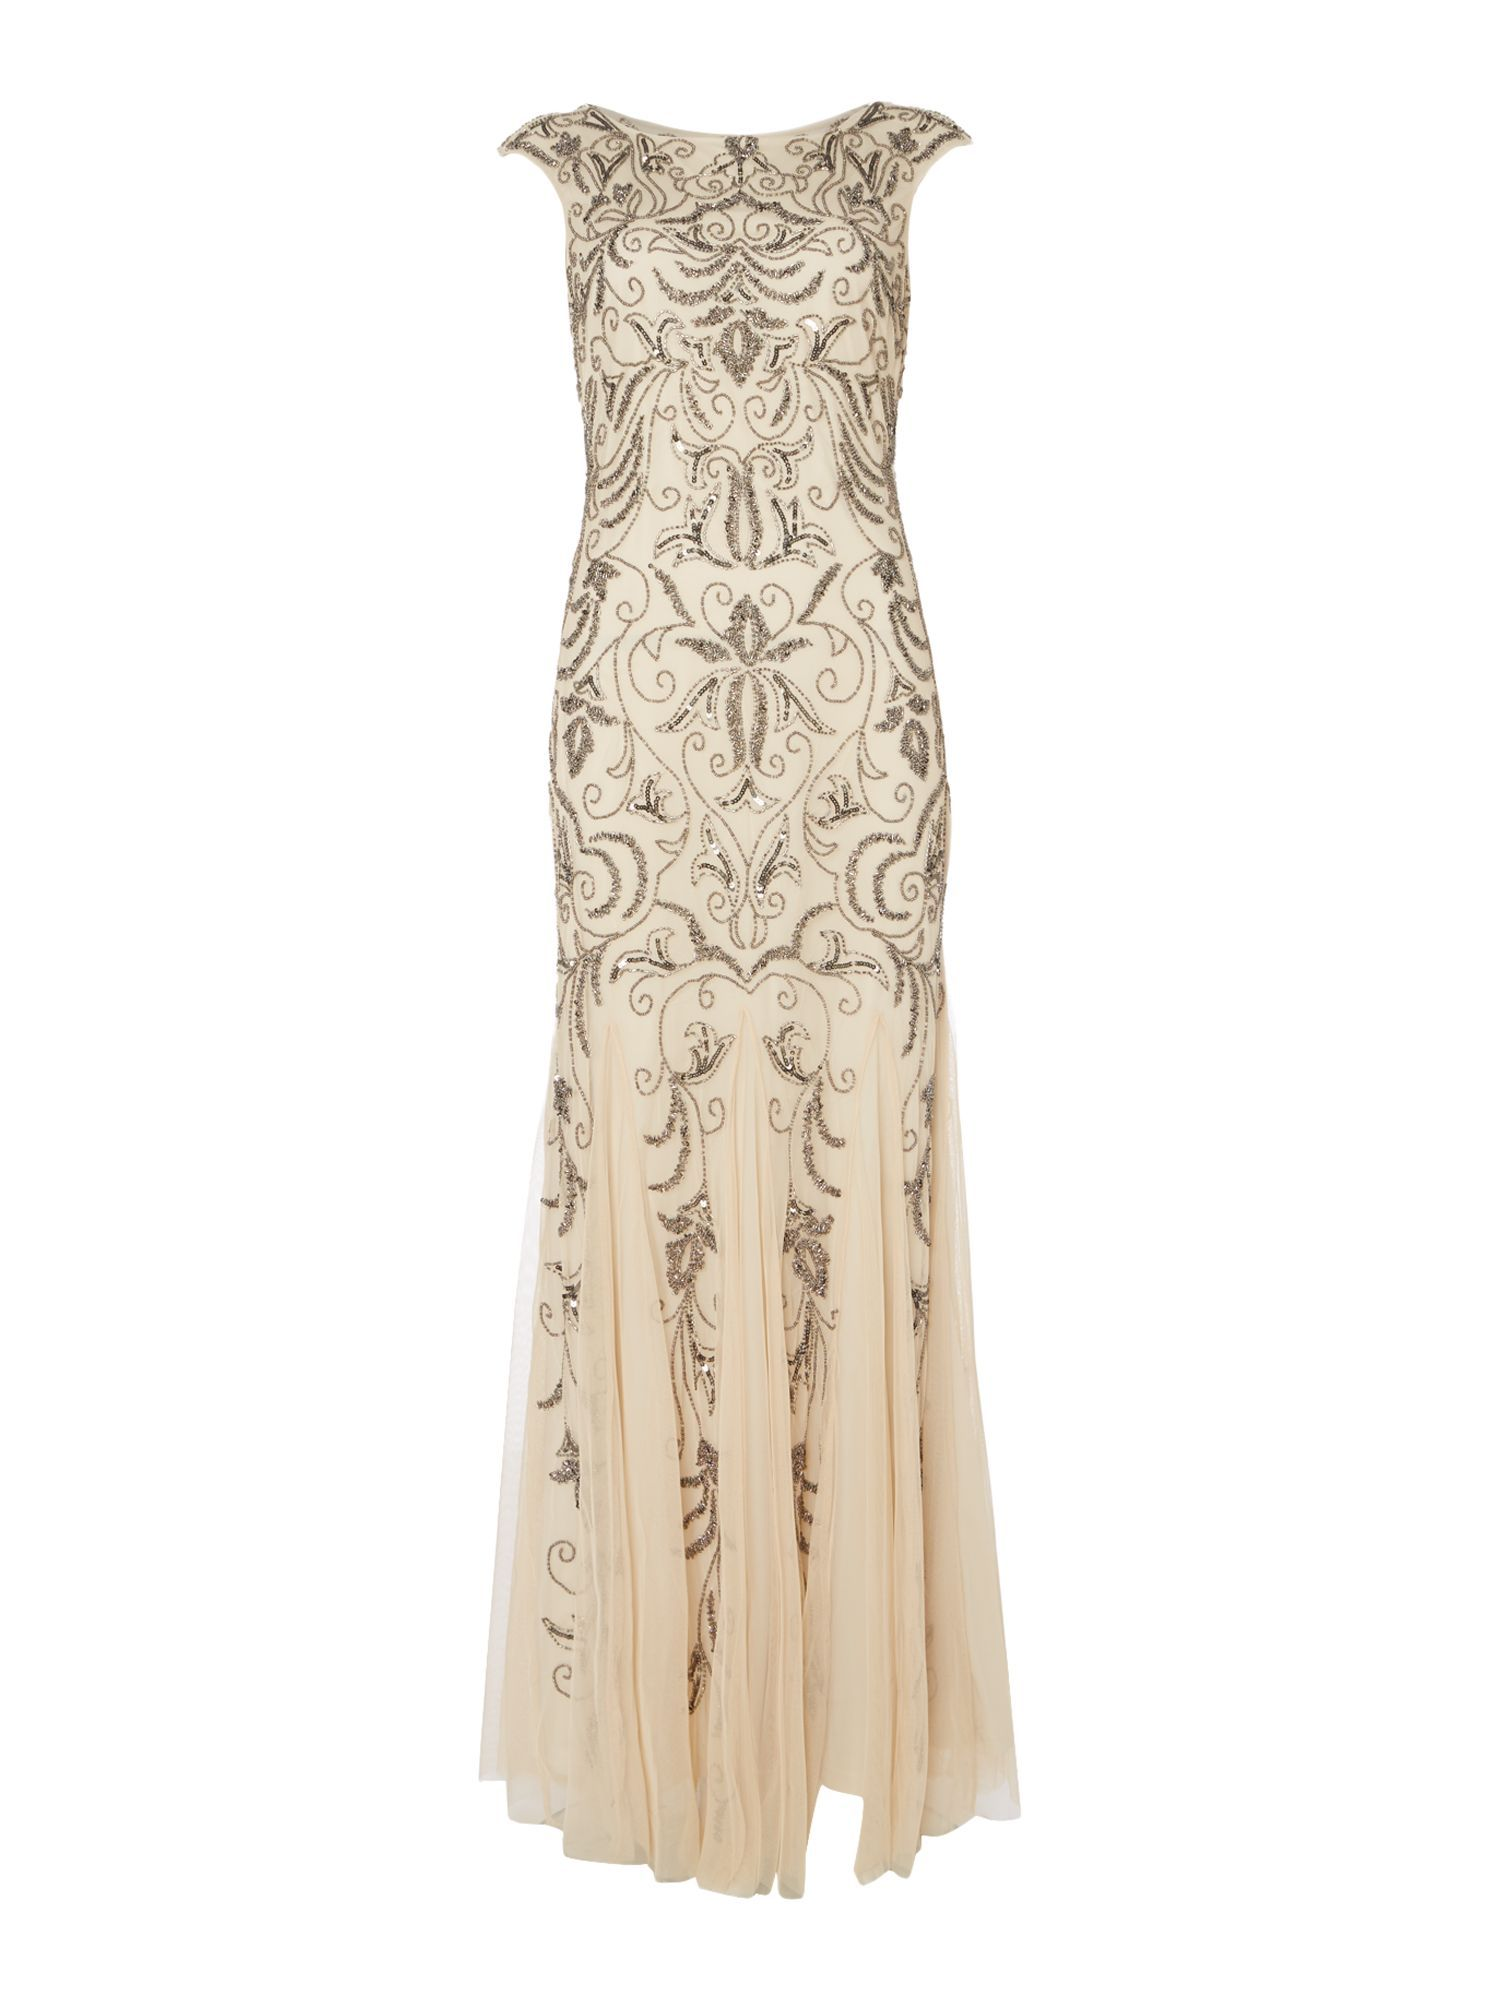 1920 s style prom dresses uk cheap